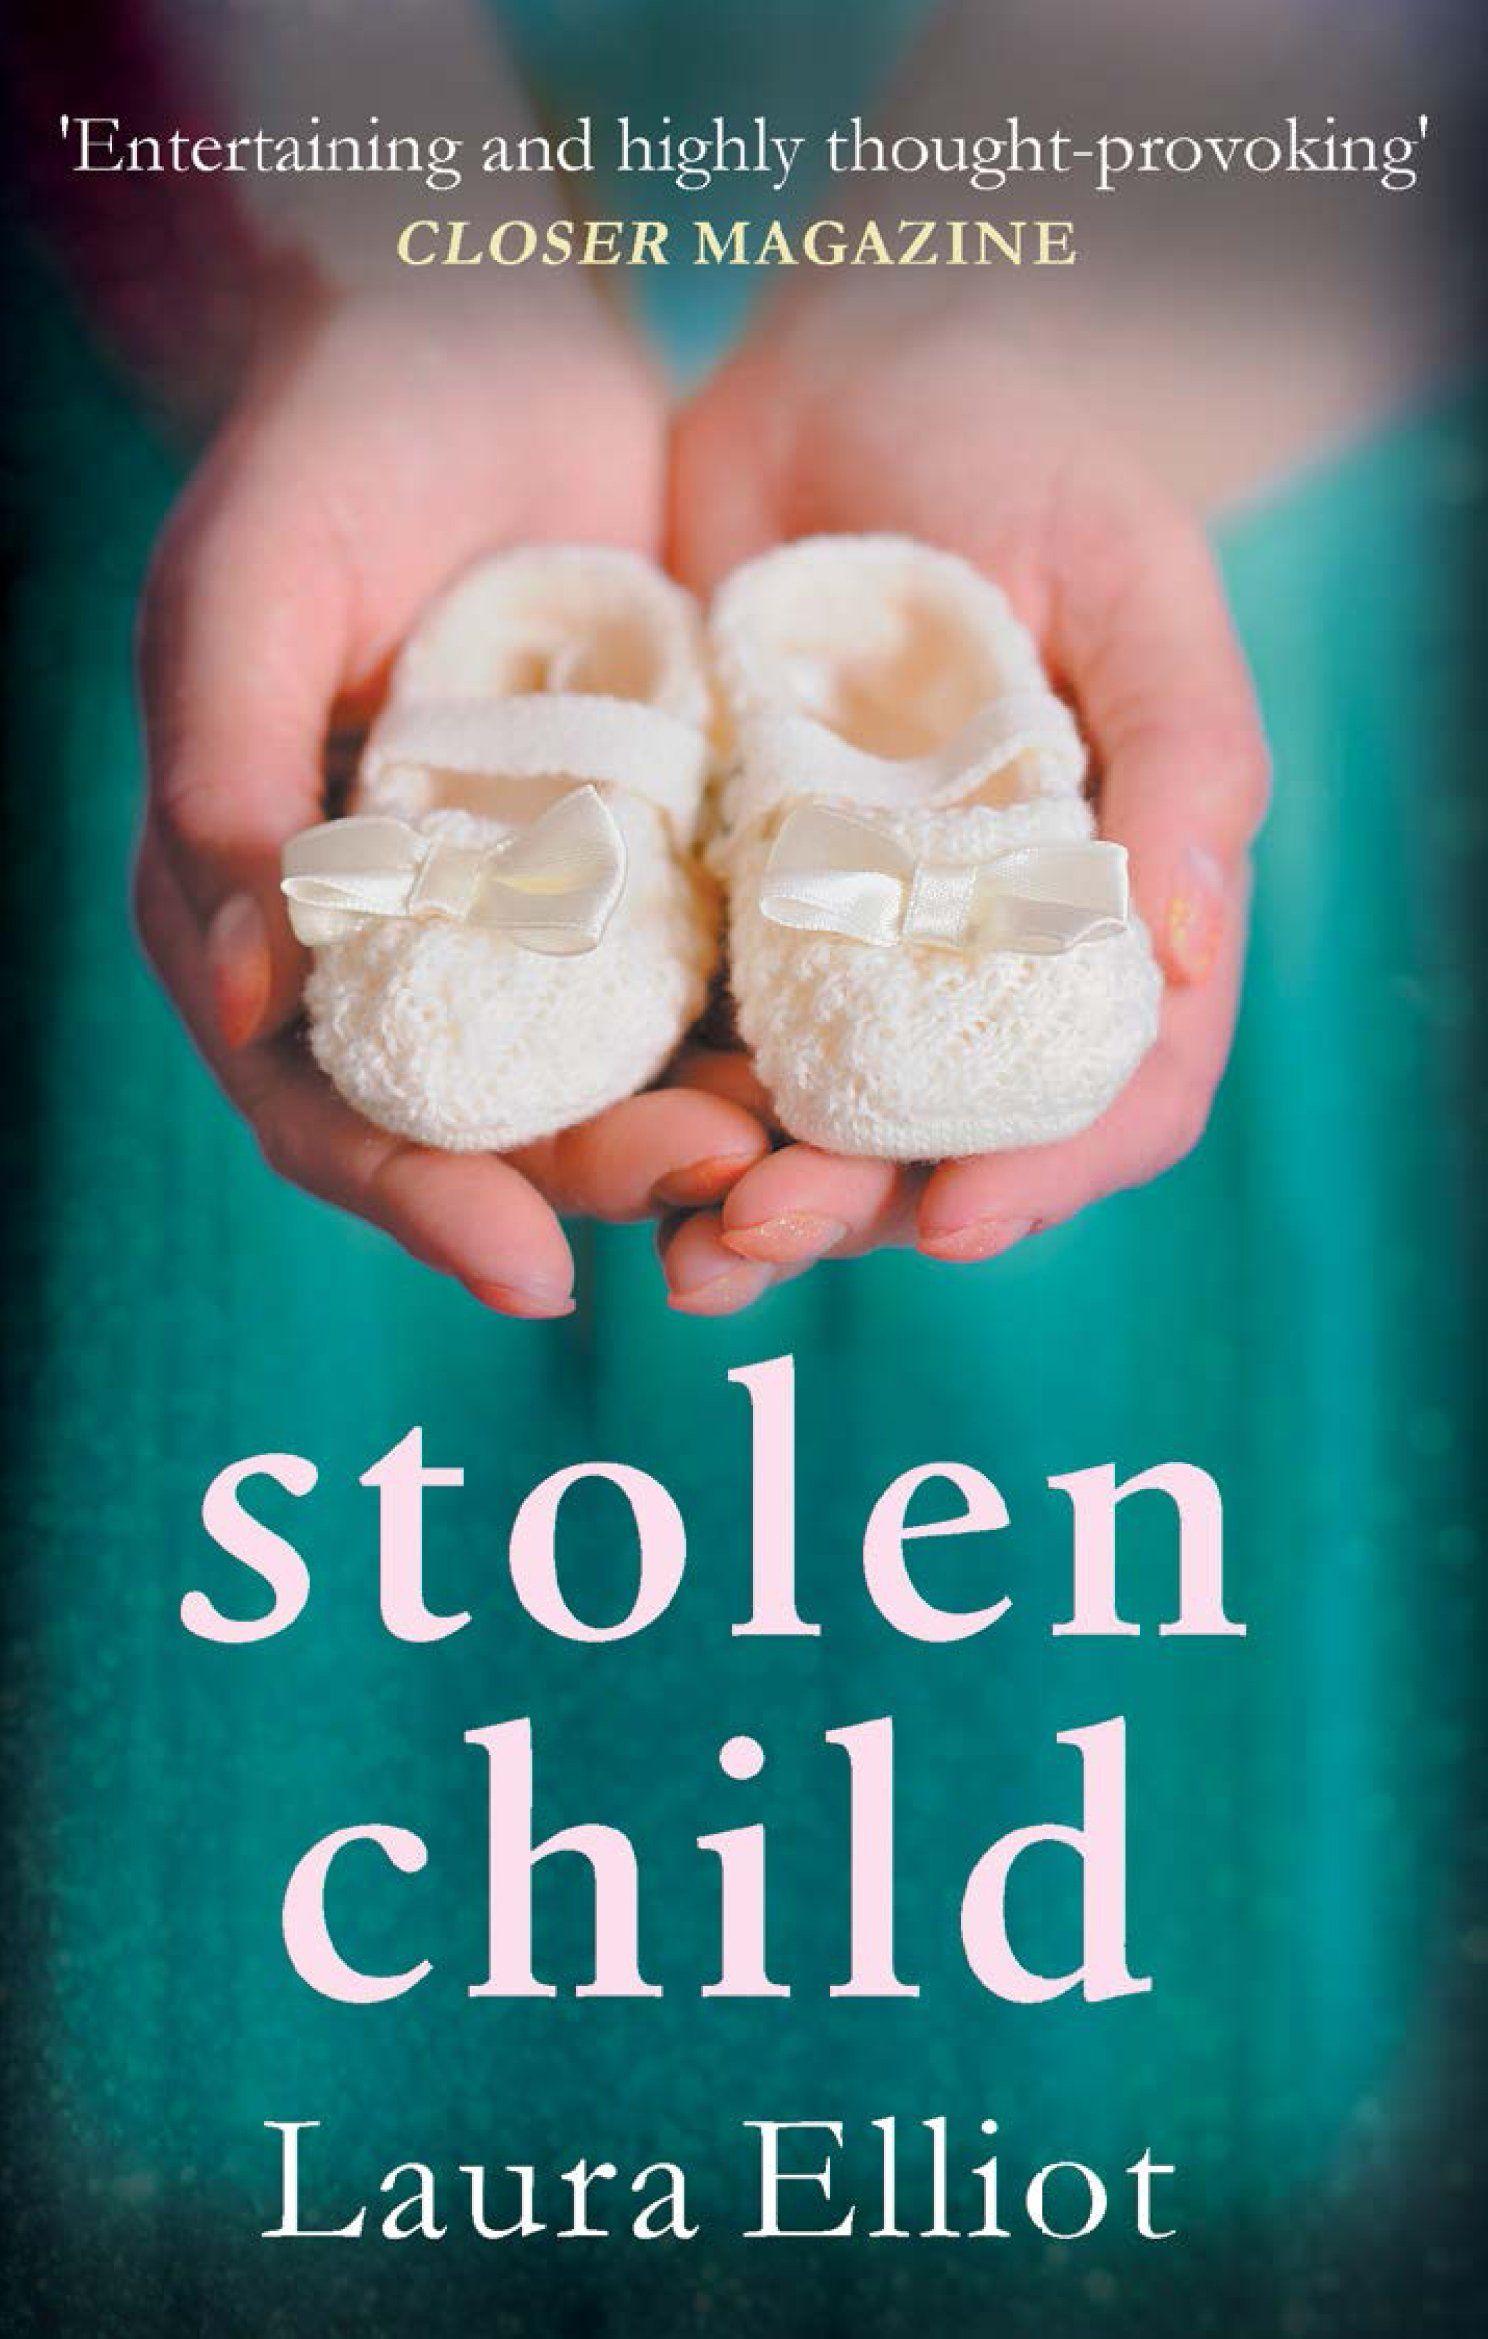 Stolen Child A Novel Of Psychological Drama And Suspense